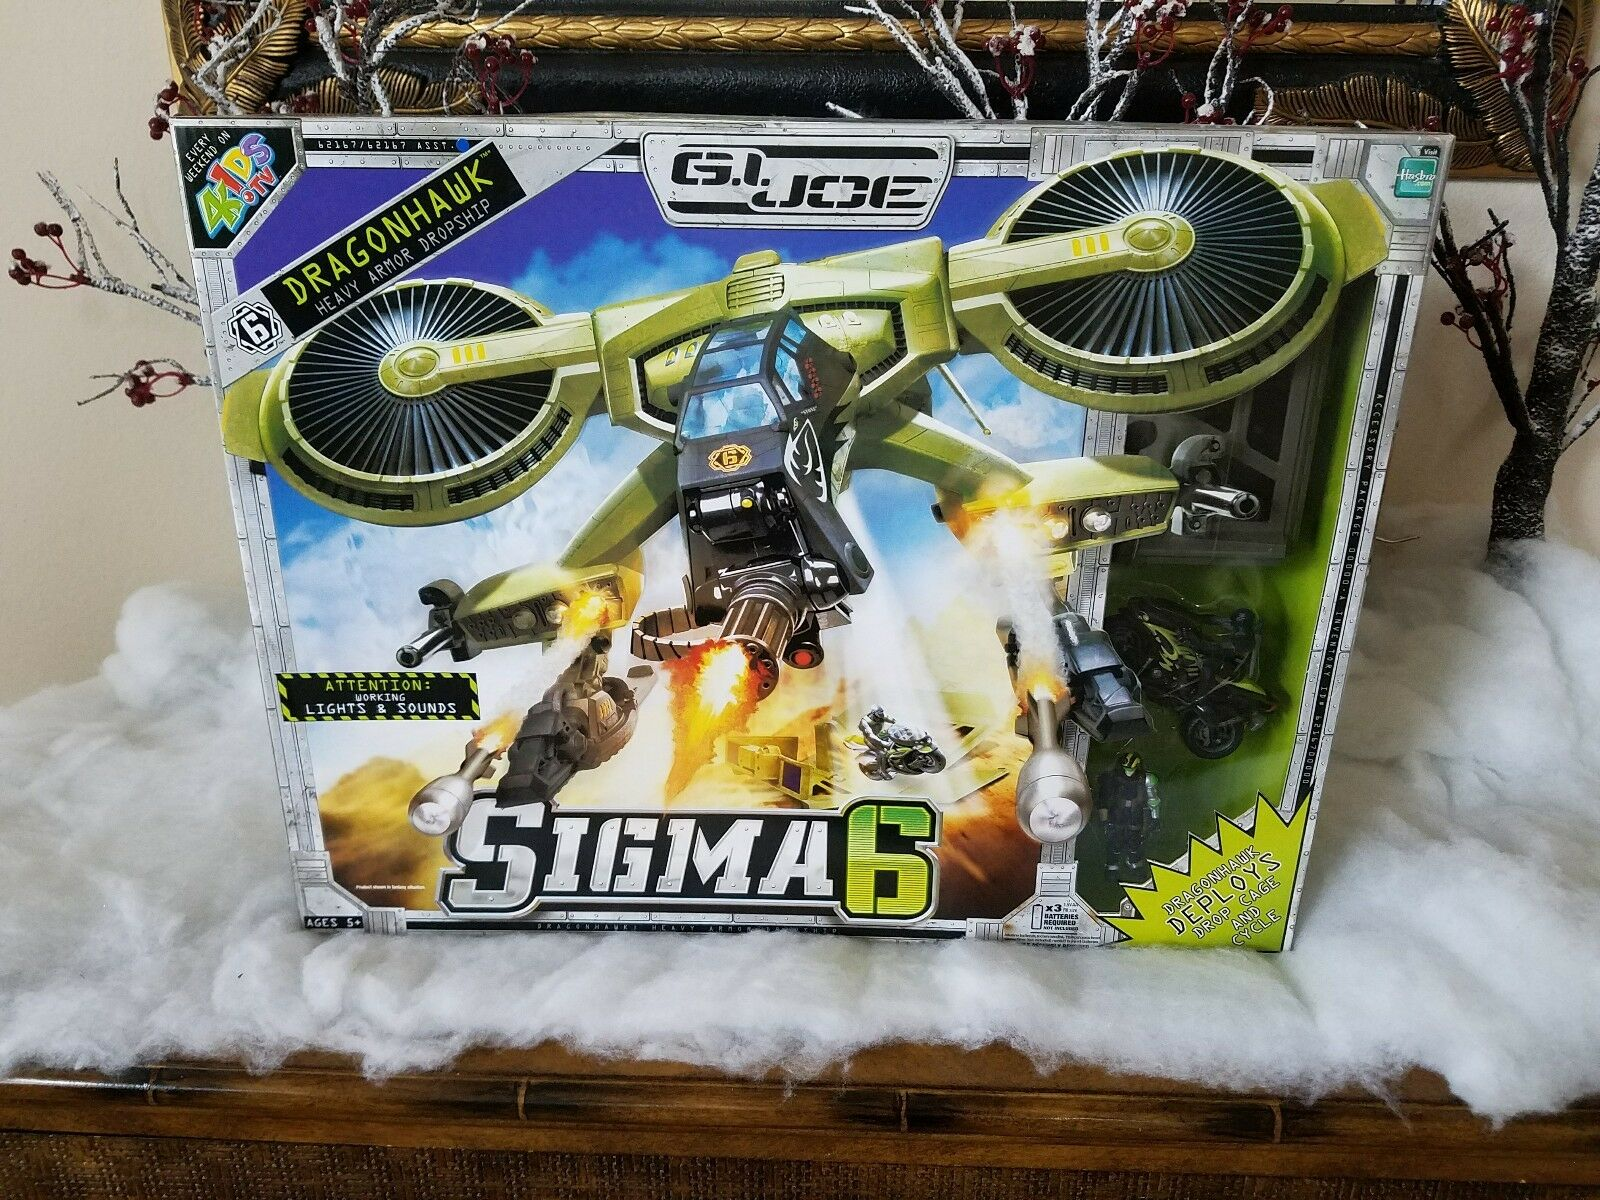 G.I. Joe Sigma 6 Dragonhawk Heavy Armor Dropship